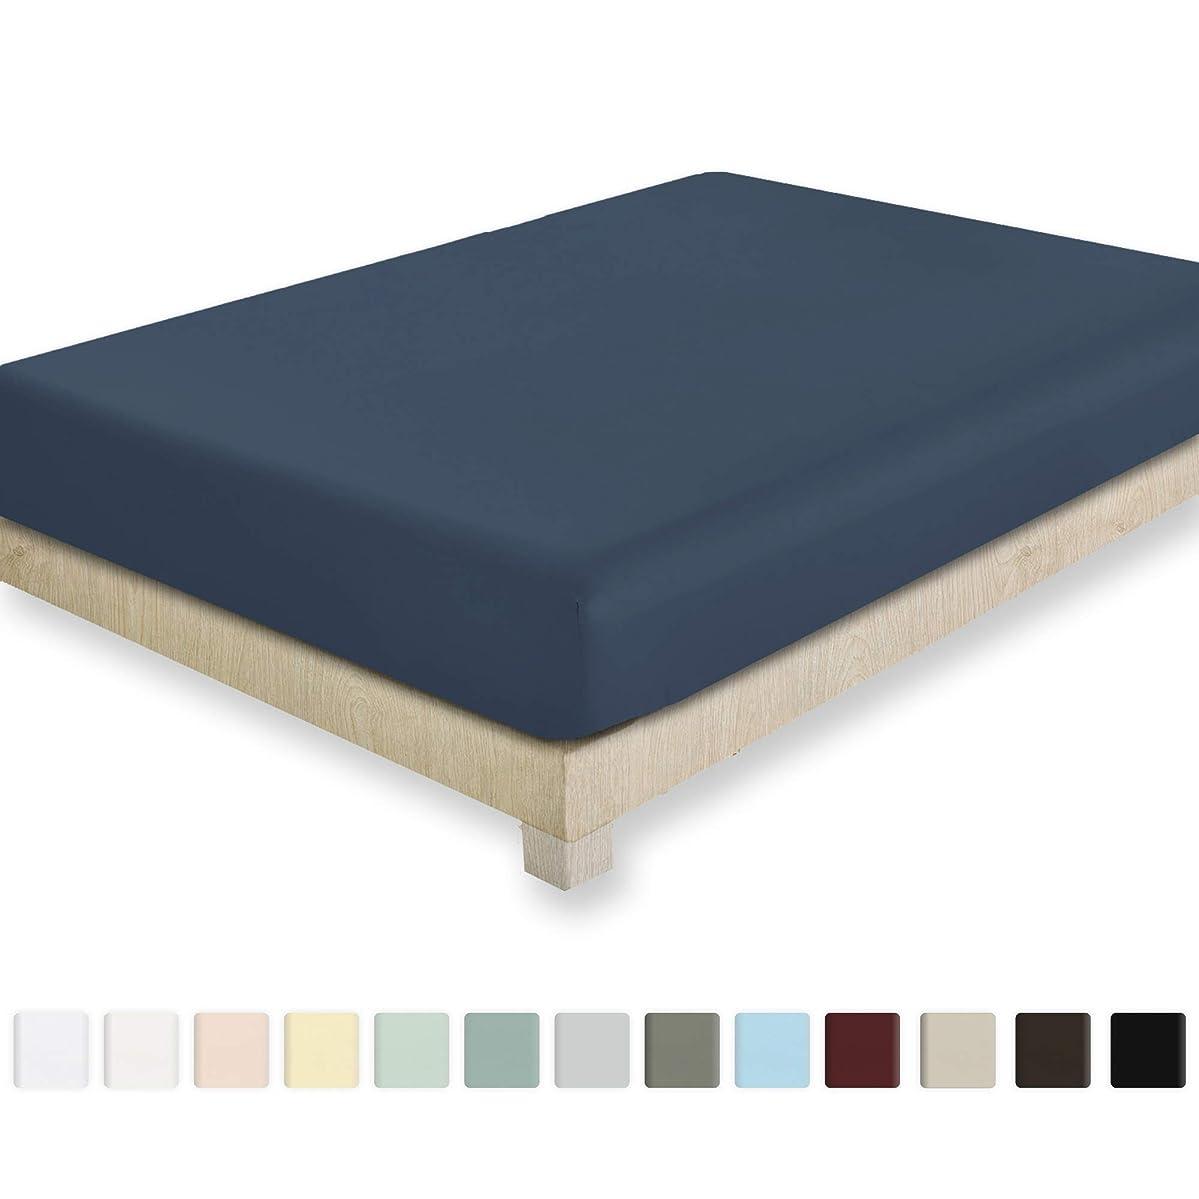 California Design Den 400 Thread Count Twin XL Size Indigo Batik Fitted Sheet - 100% Cotton 1 Pc Bottom Fitted Sheet Only, Long Staple Combed Pure Cotton Bedsheet, Lightweight, Soft Sateen Weave